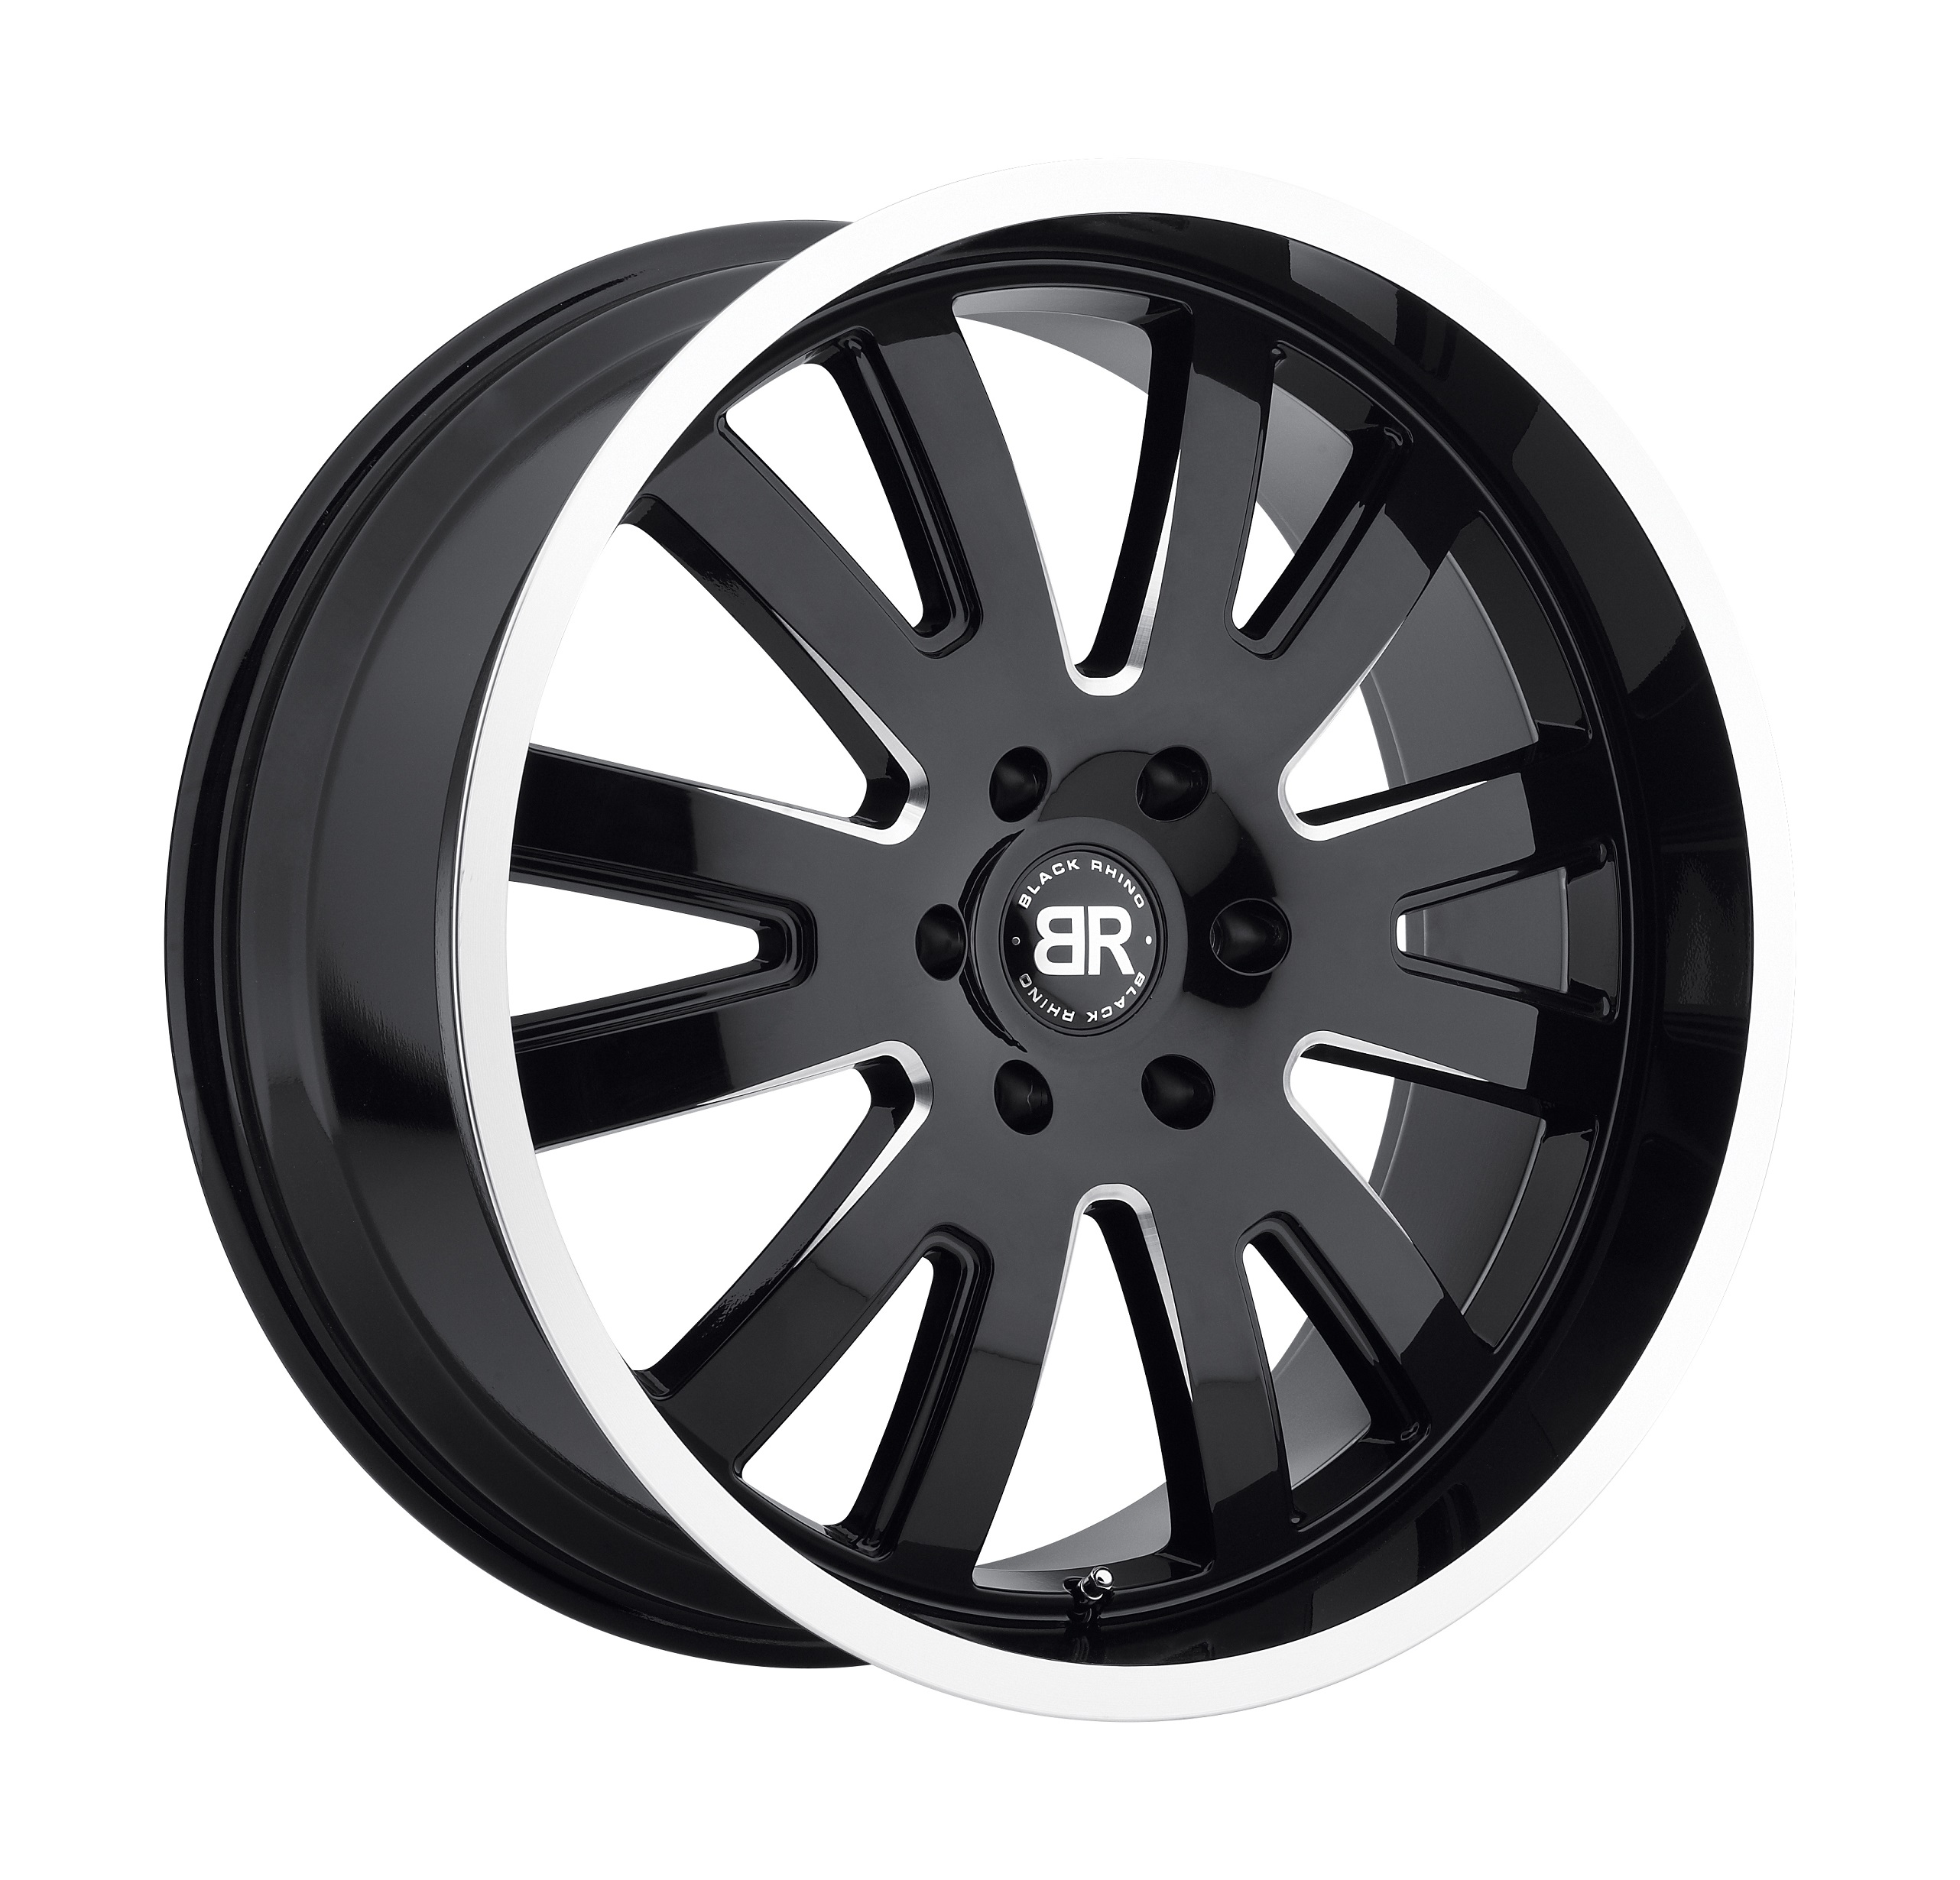 Truck Wheels Rims : Motor n black rhino wheels introduces seven new massive